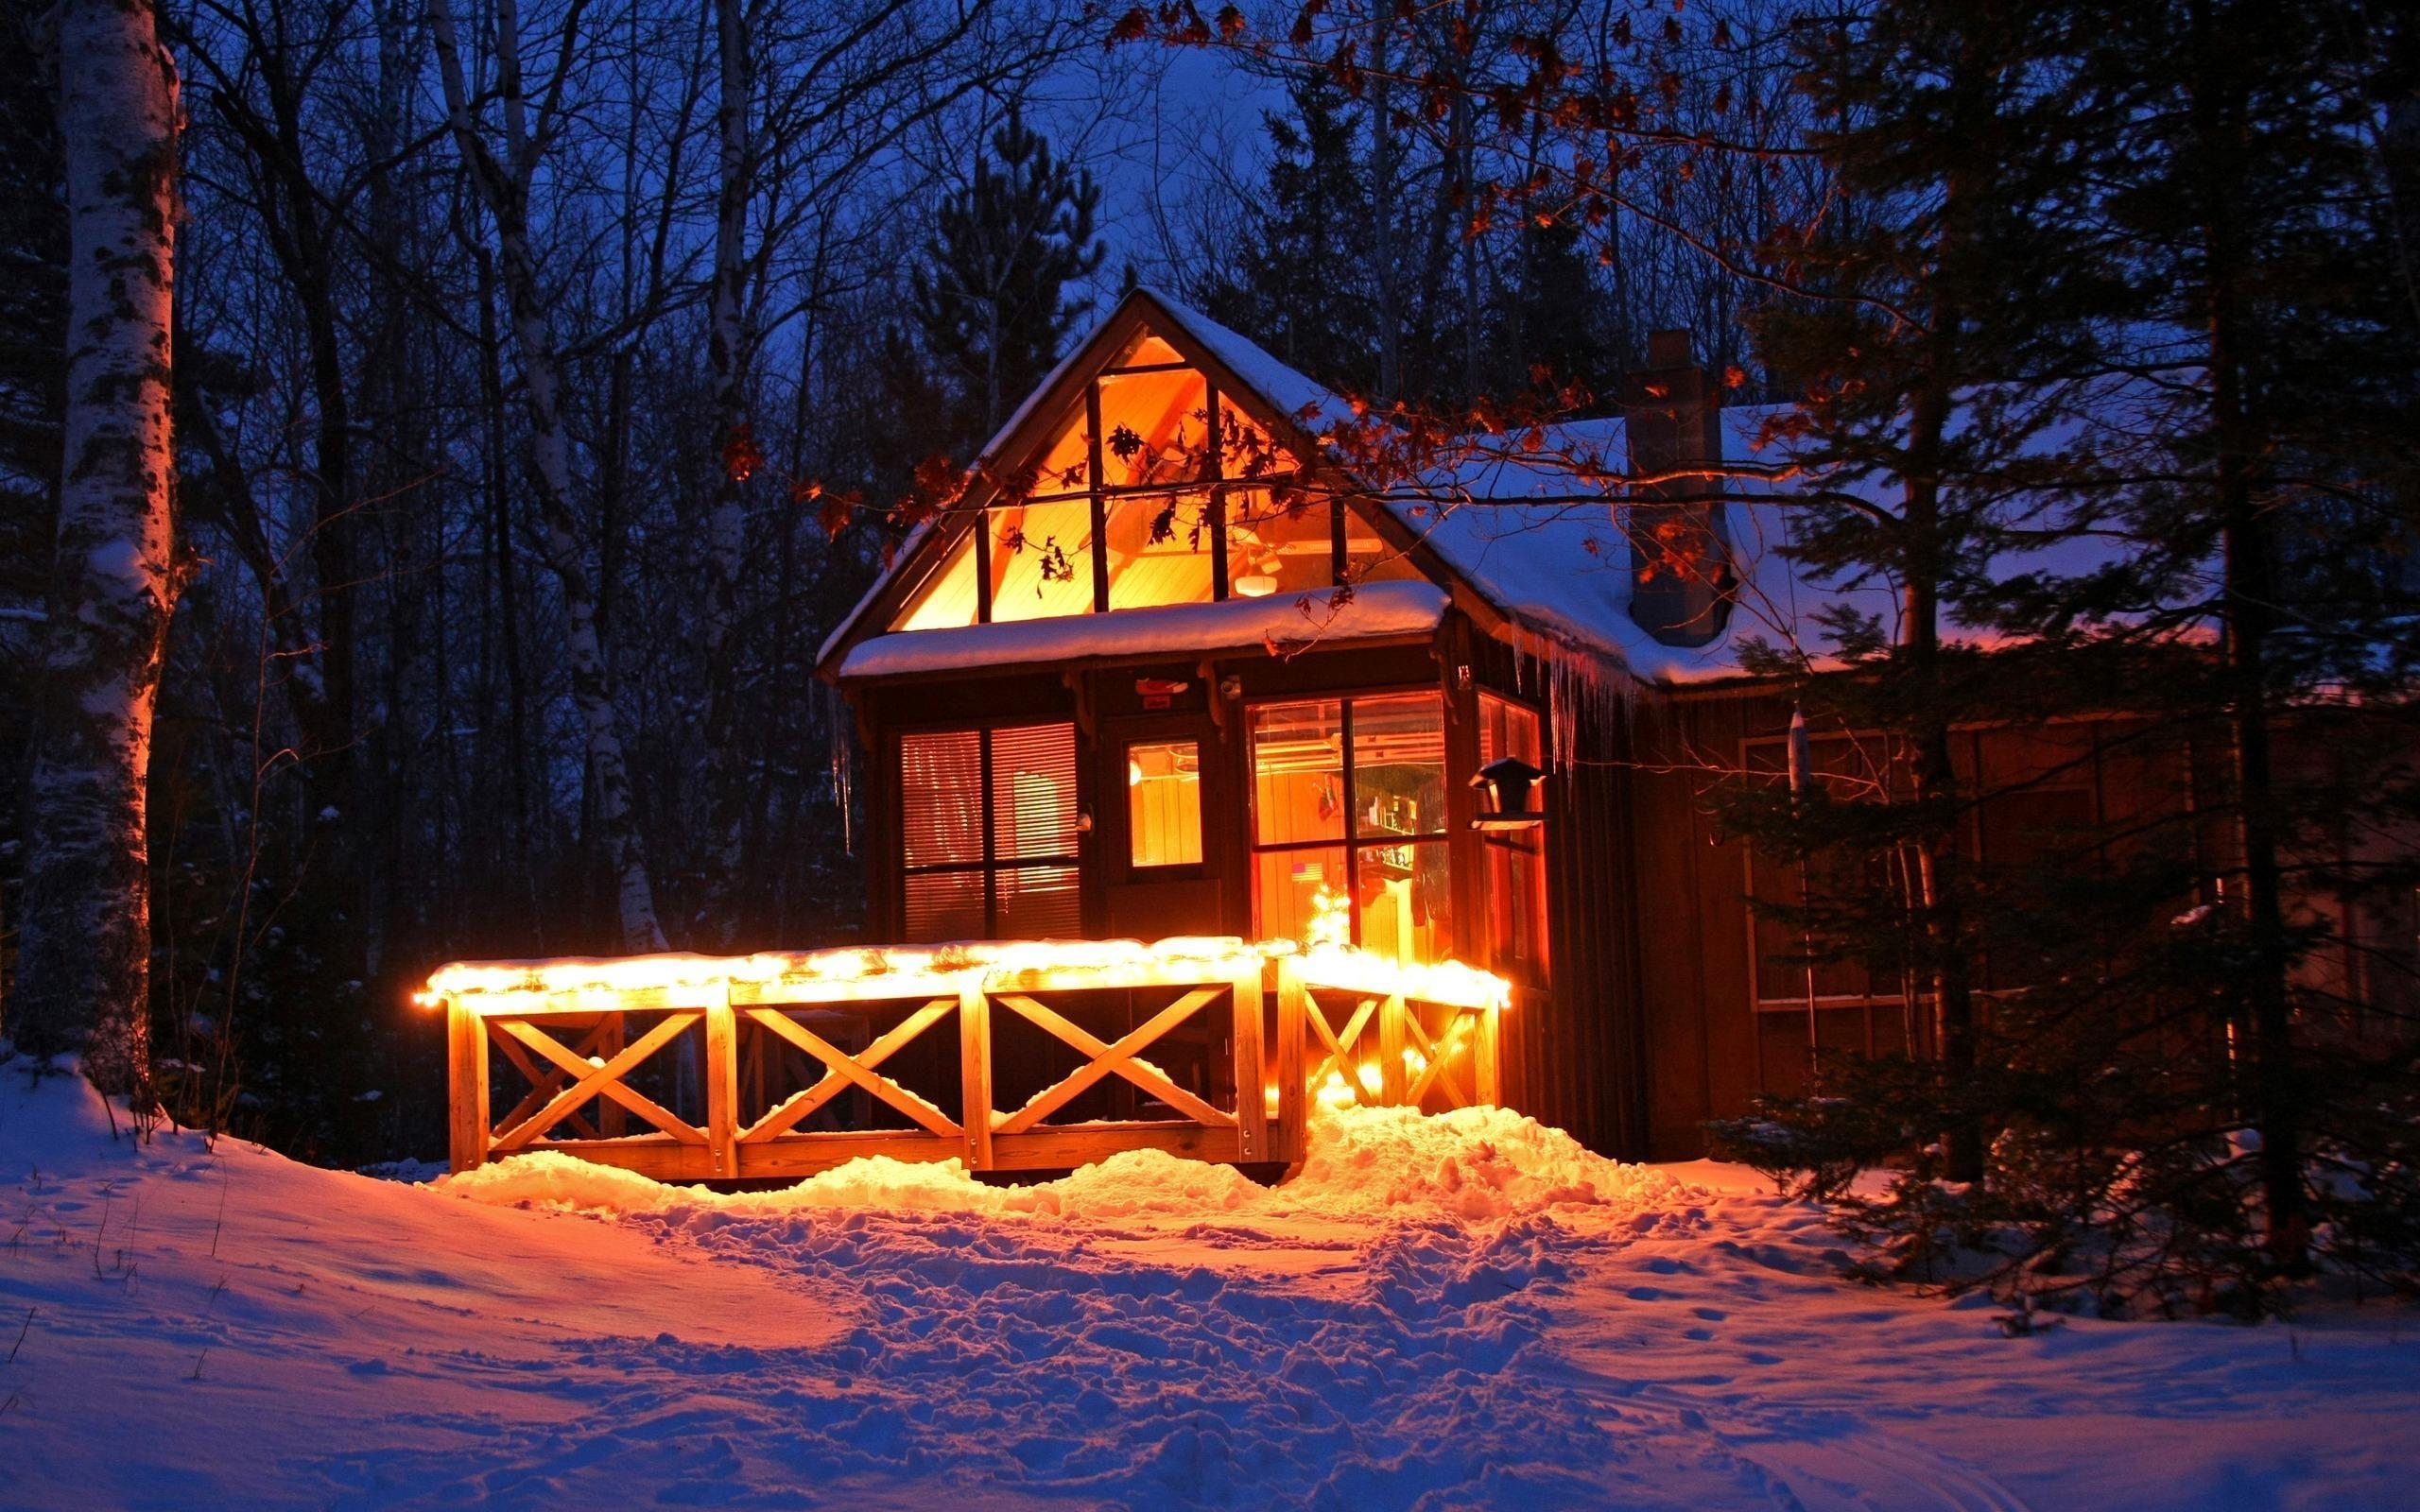 Winter Cabin Wallpapers - Wallpaper Cave